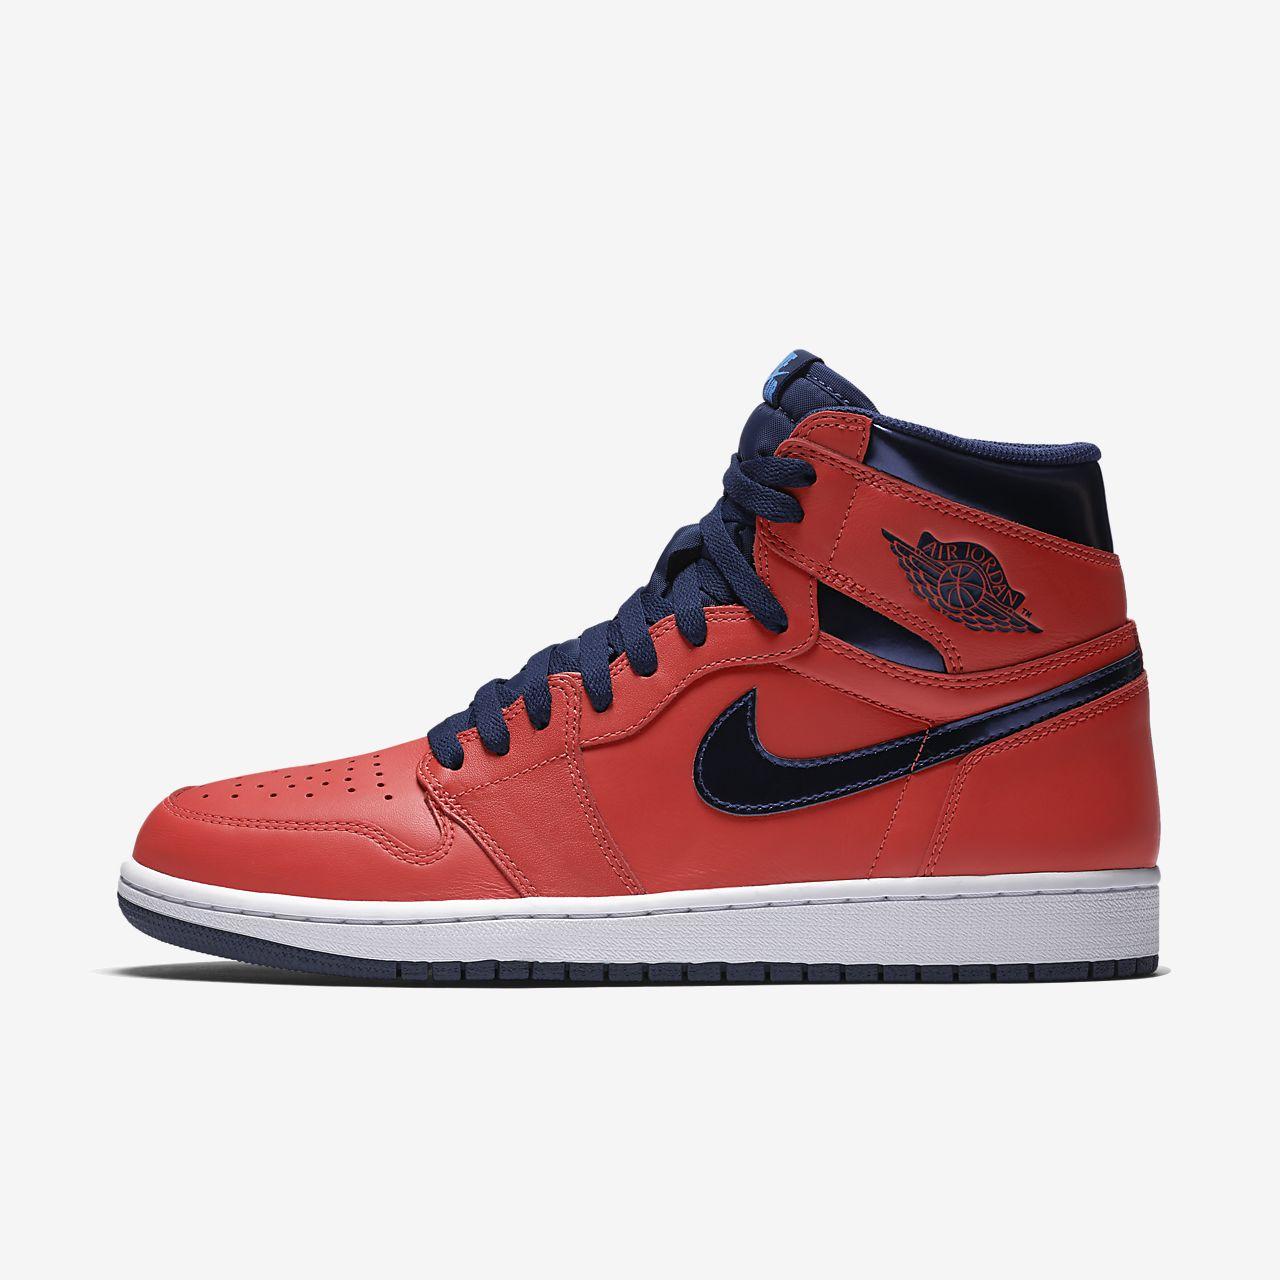 new styles f9a07 118dc ... Air Jordan 1 Retro High OG Shoe